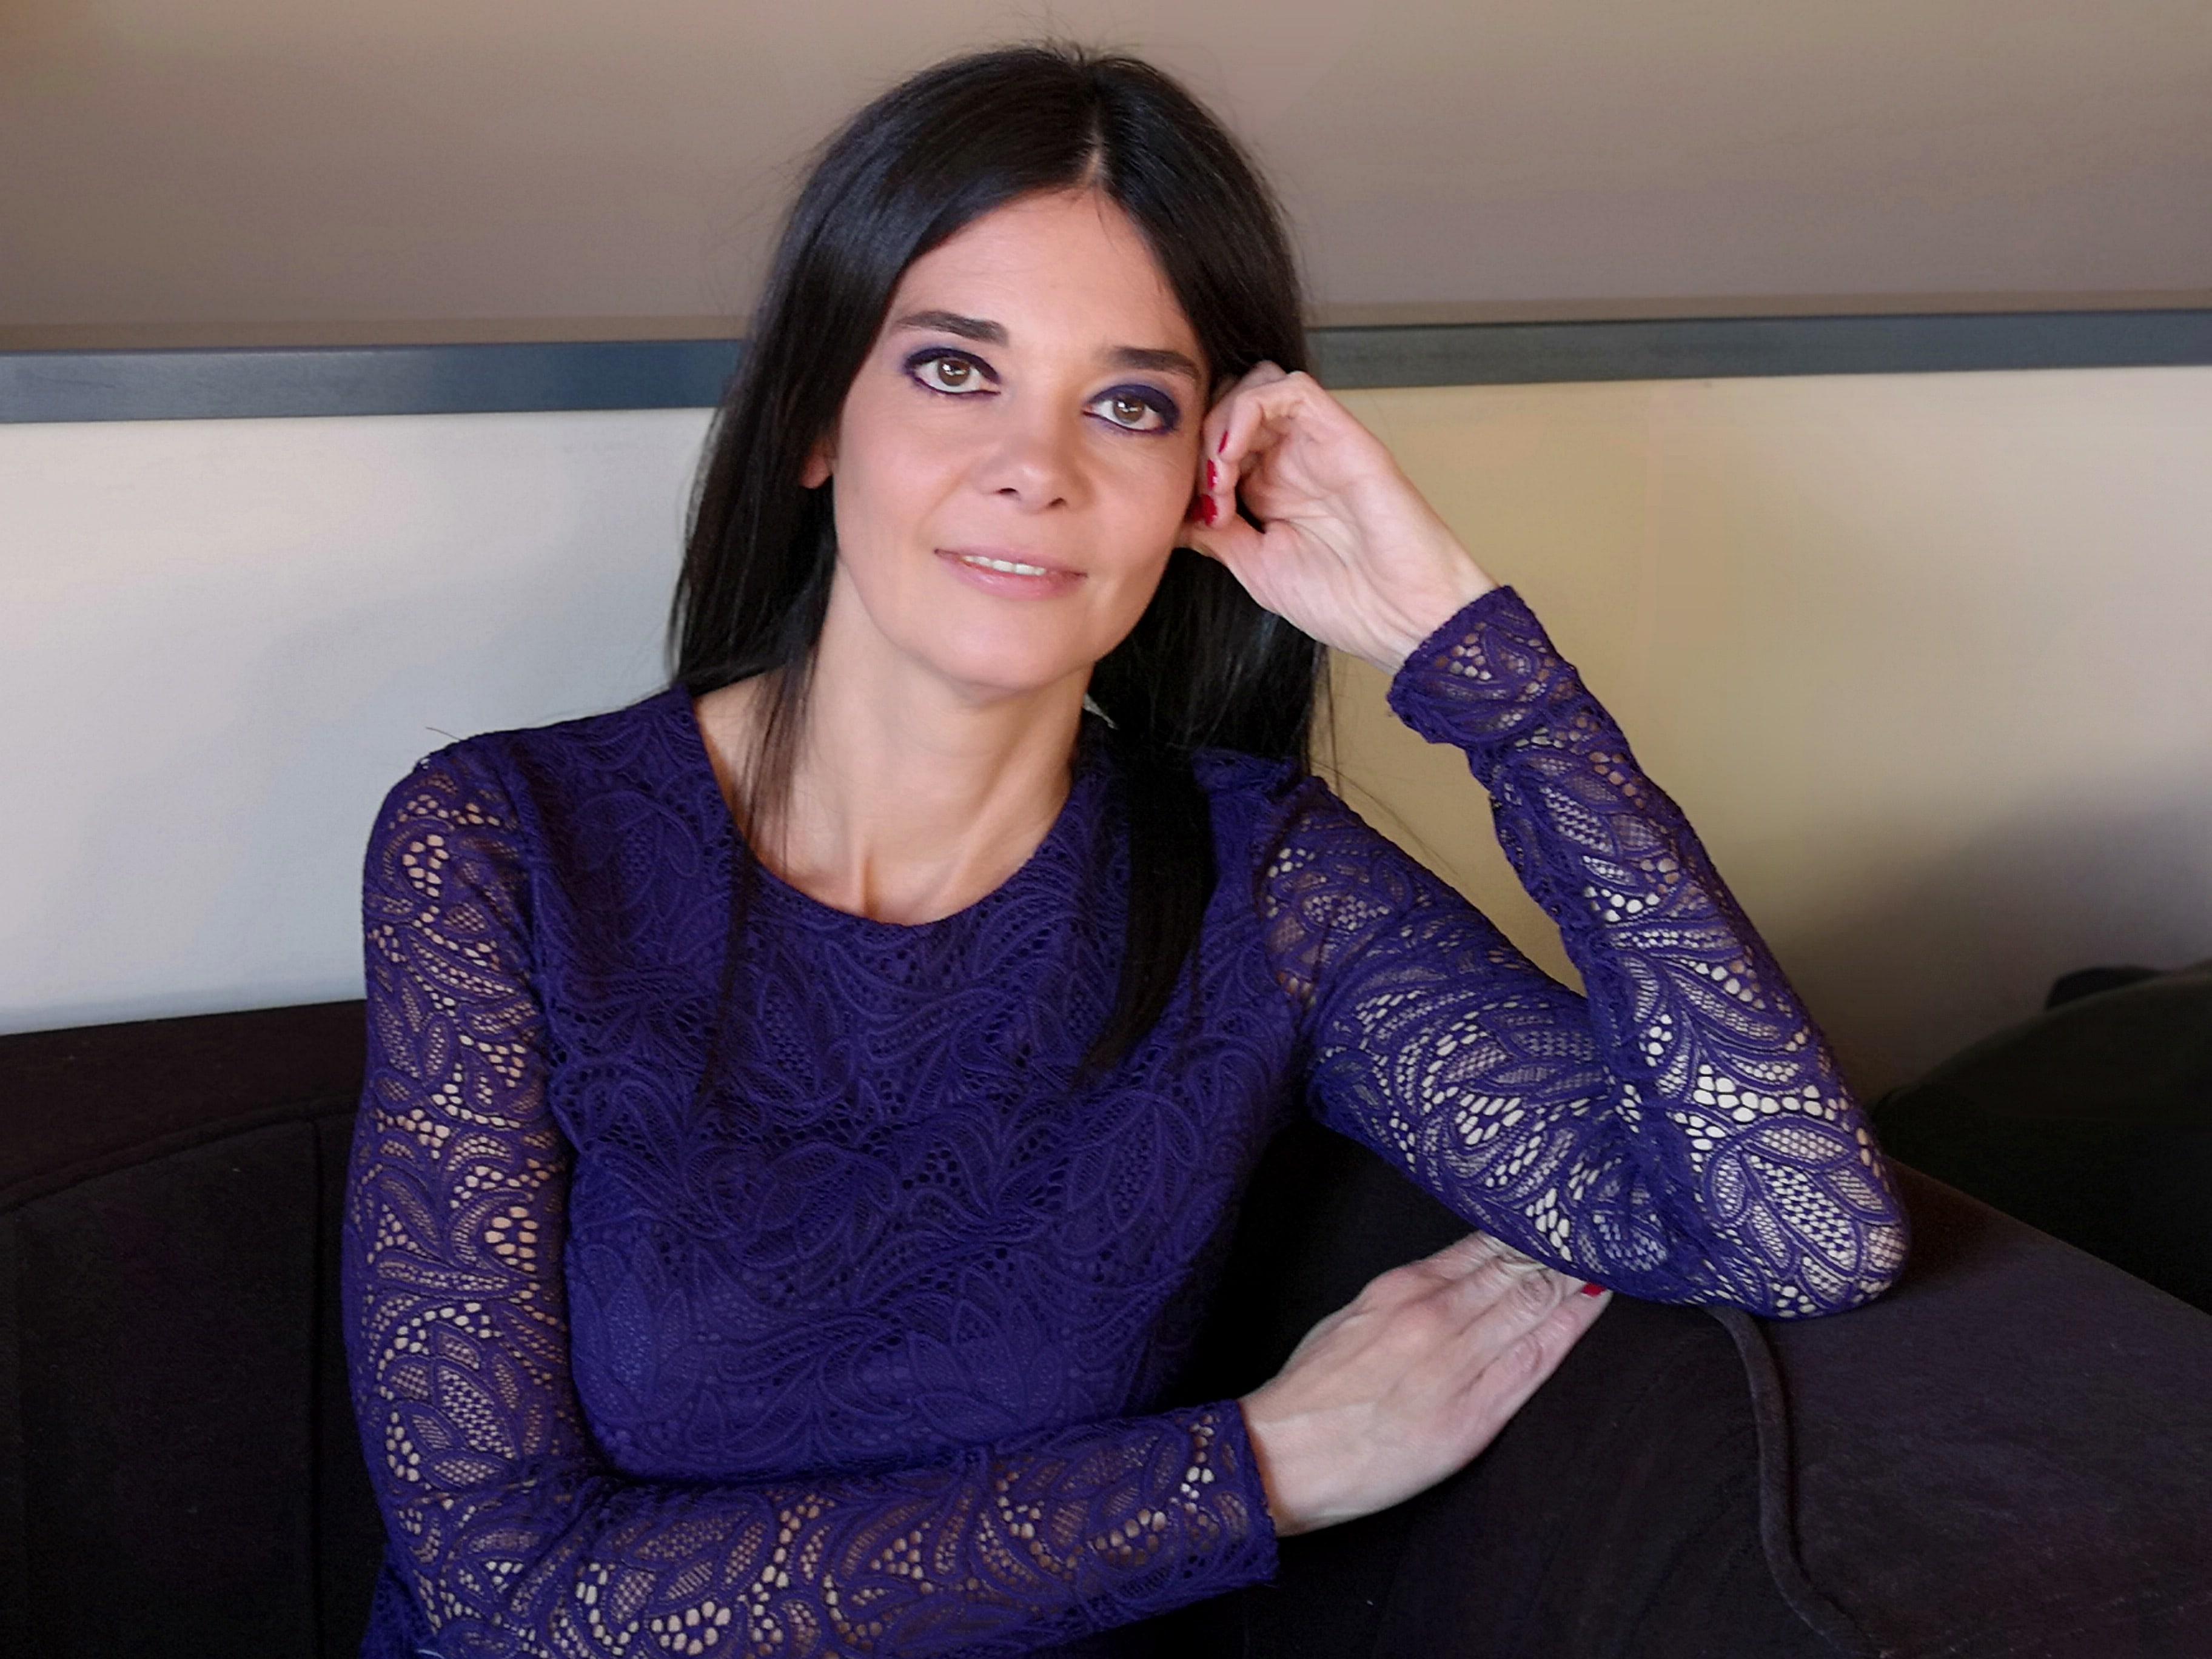 Silvia Leal entrevista Sinnaps